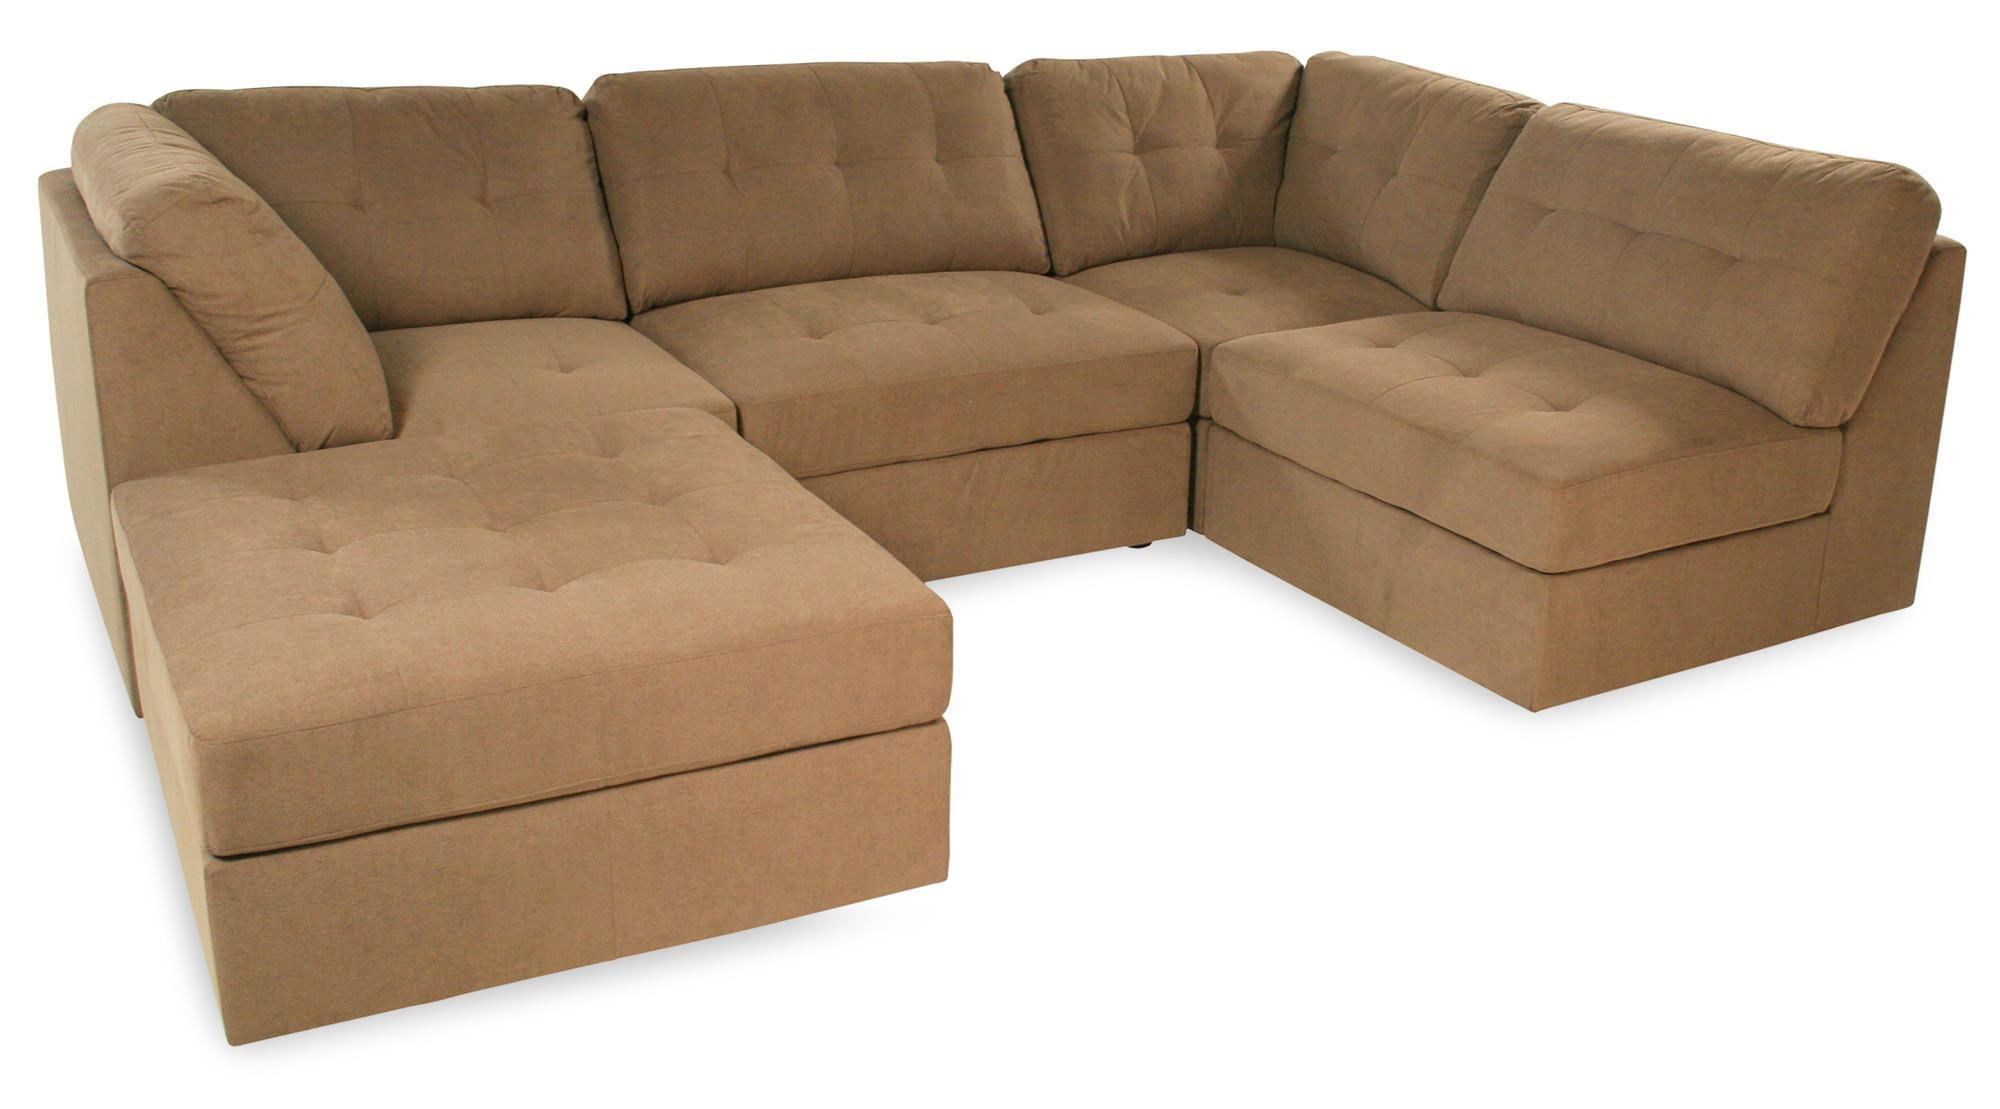 Lifestyle Sabrina: TaupeSectional Sofa ...